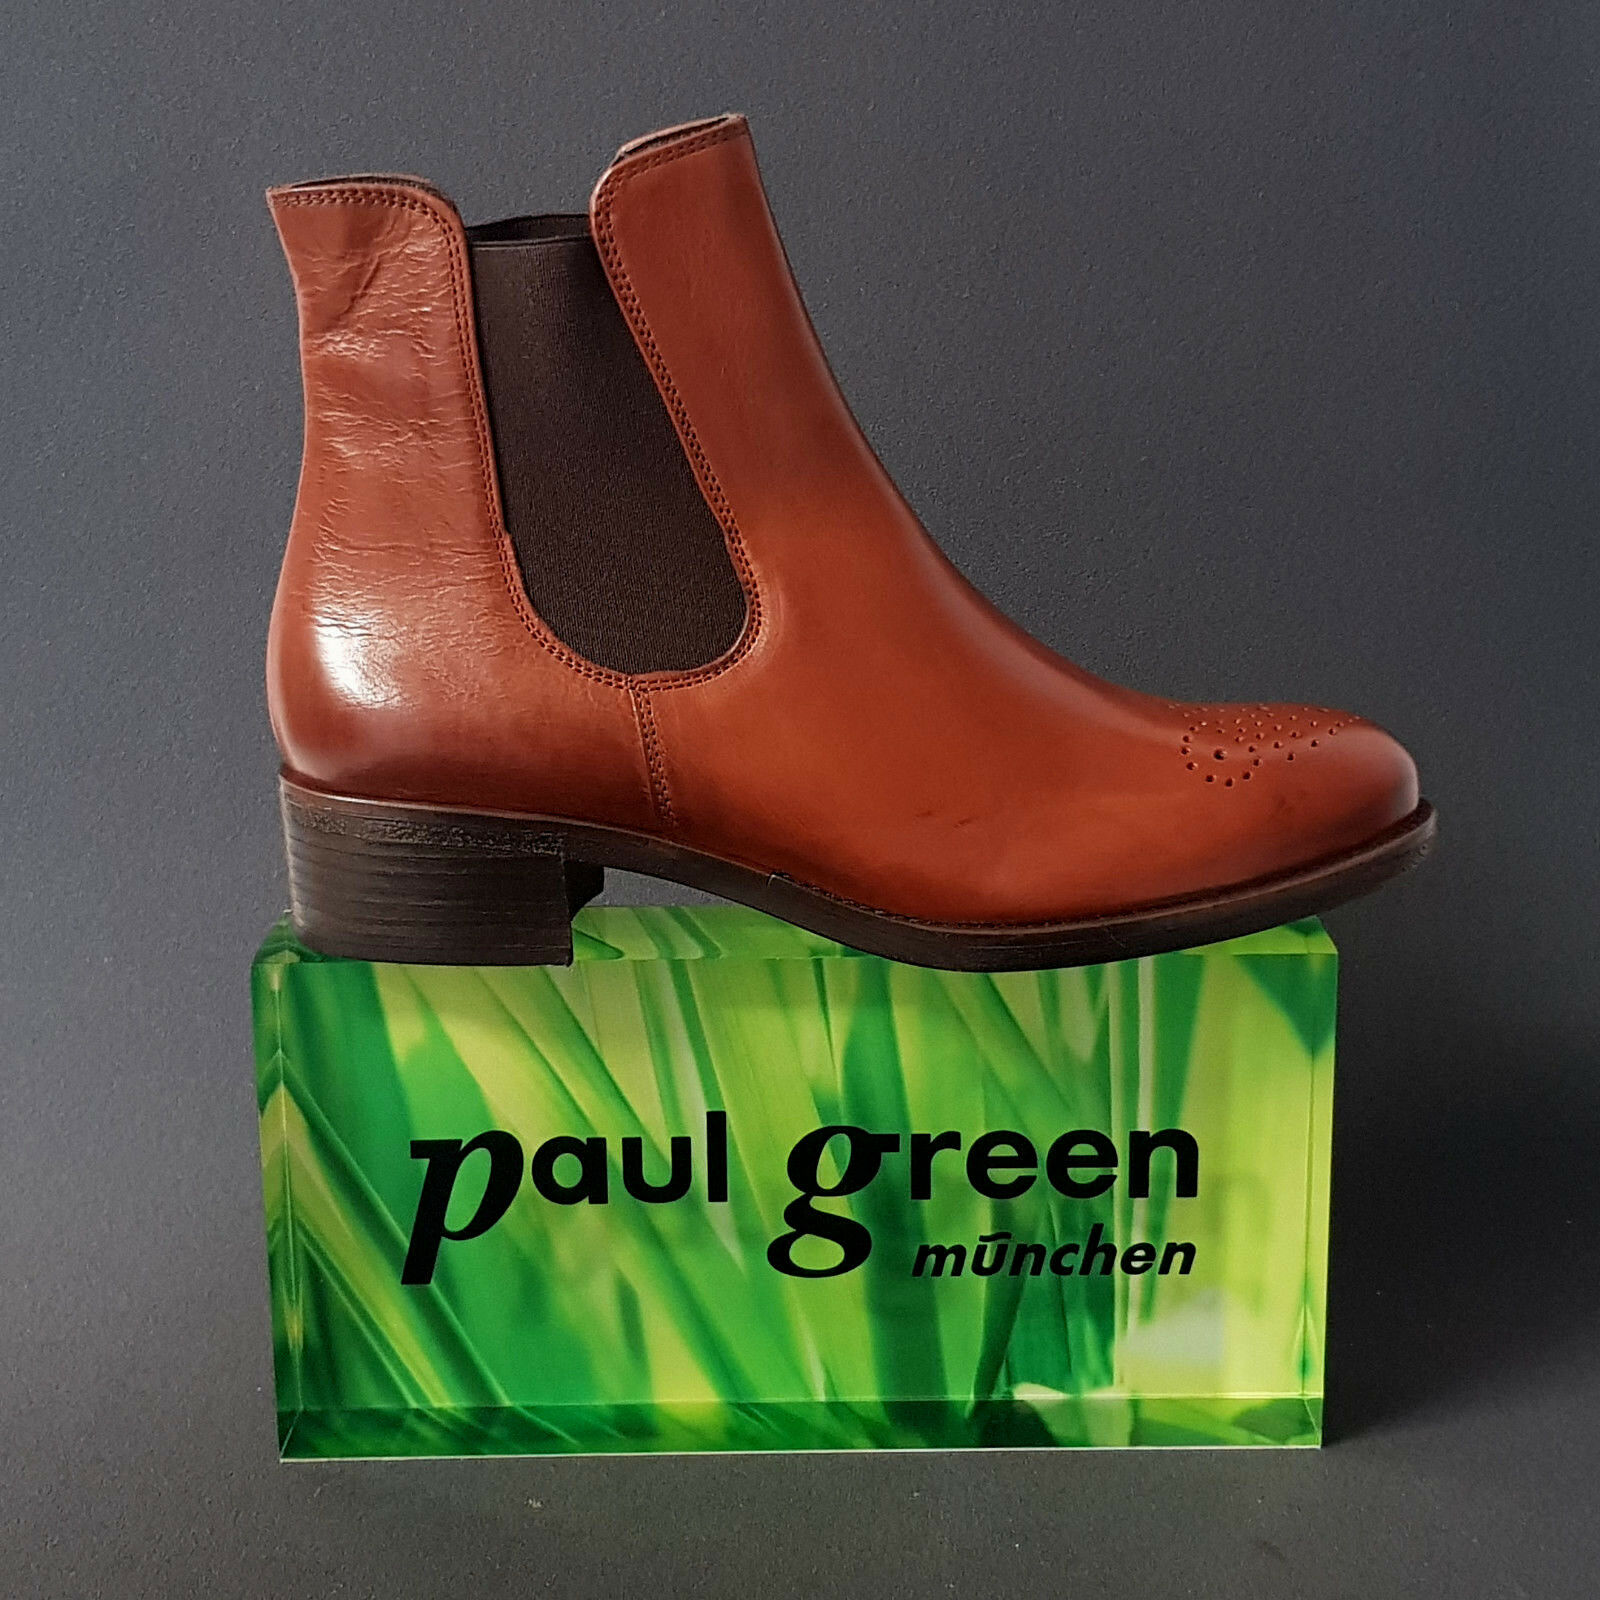 Paul Grün Damen braun Stiefel Stiefeletten Chelsea Stiefel braun Damen cognac 9190 Leder Neu 67086c